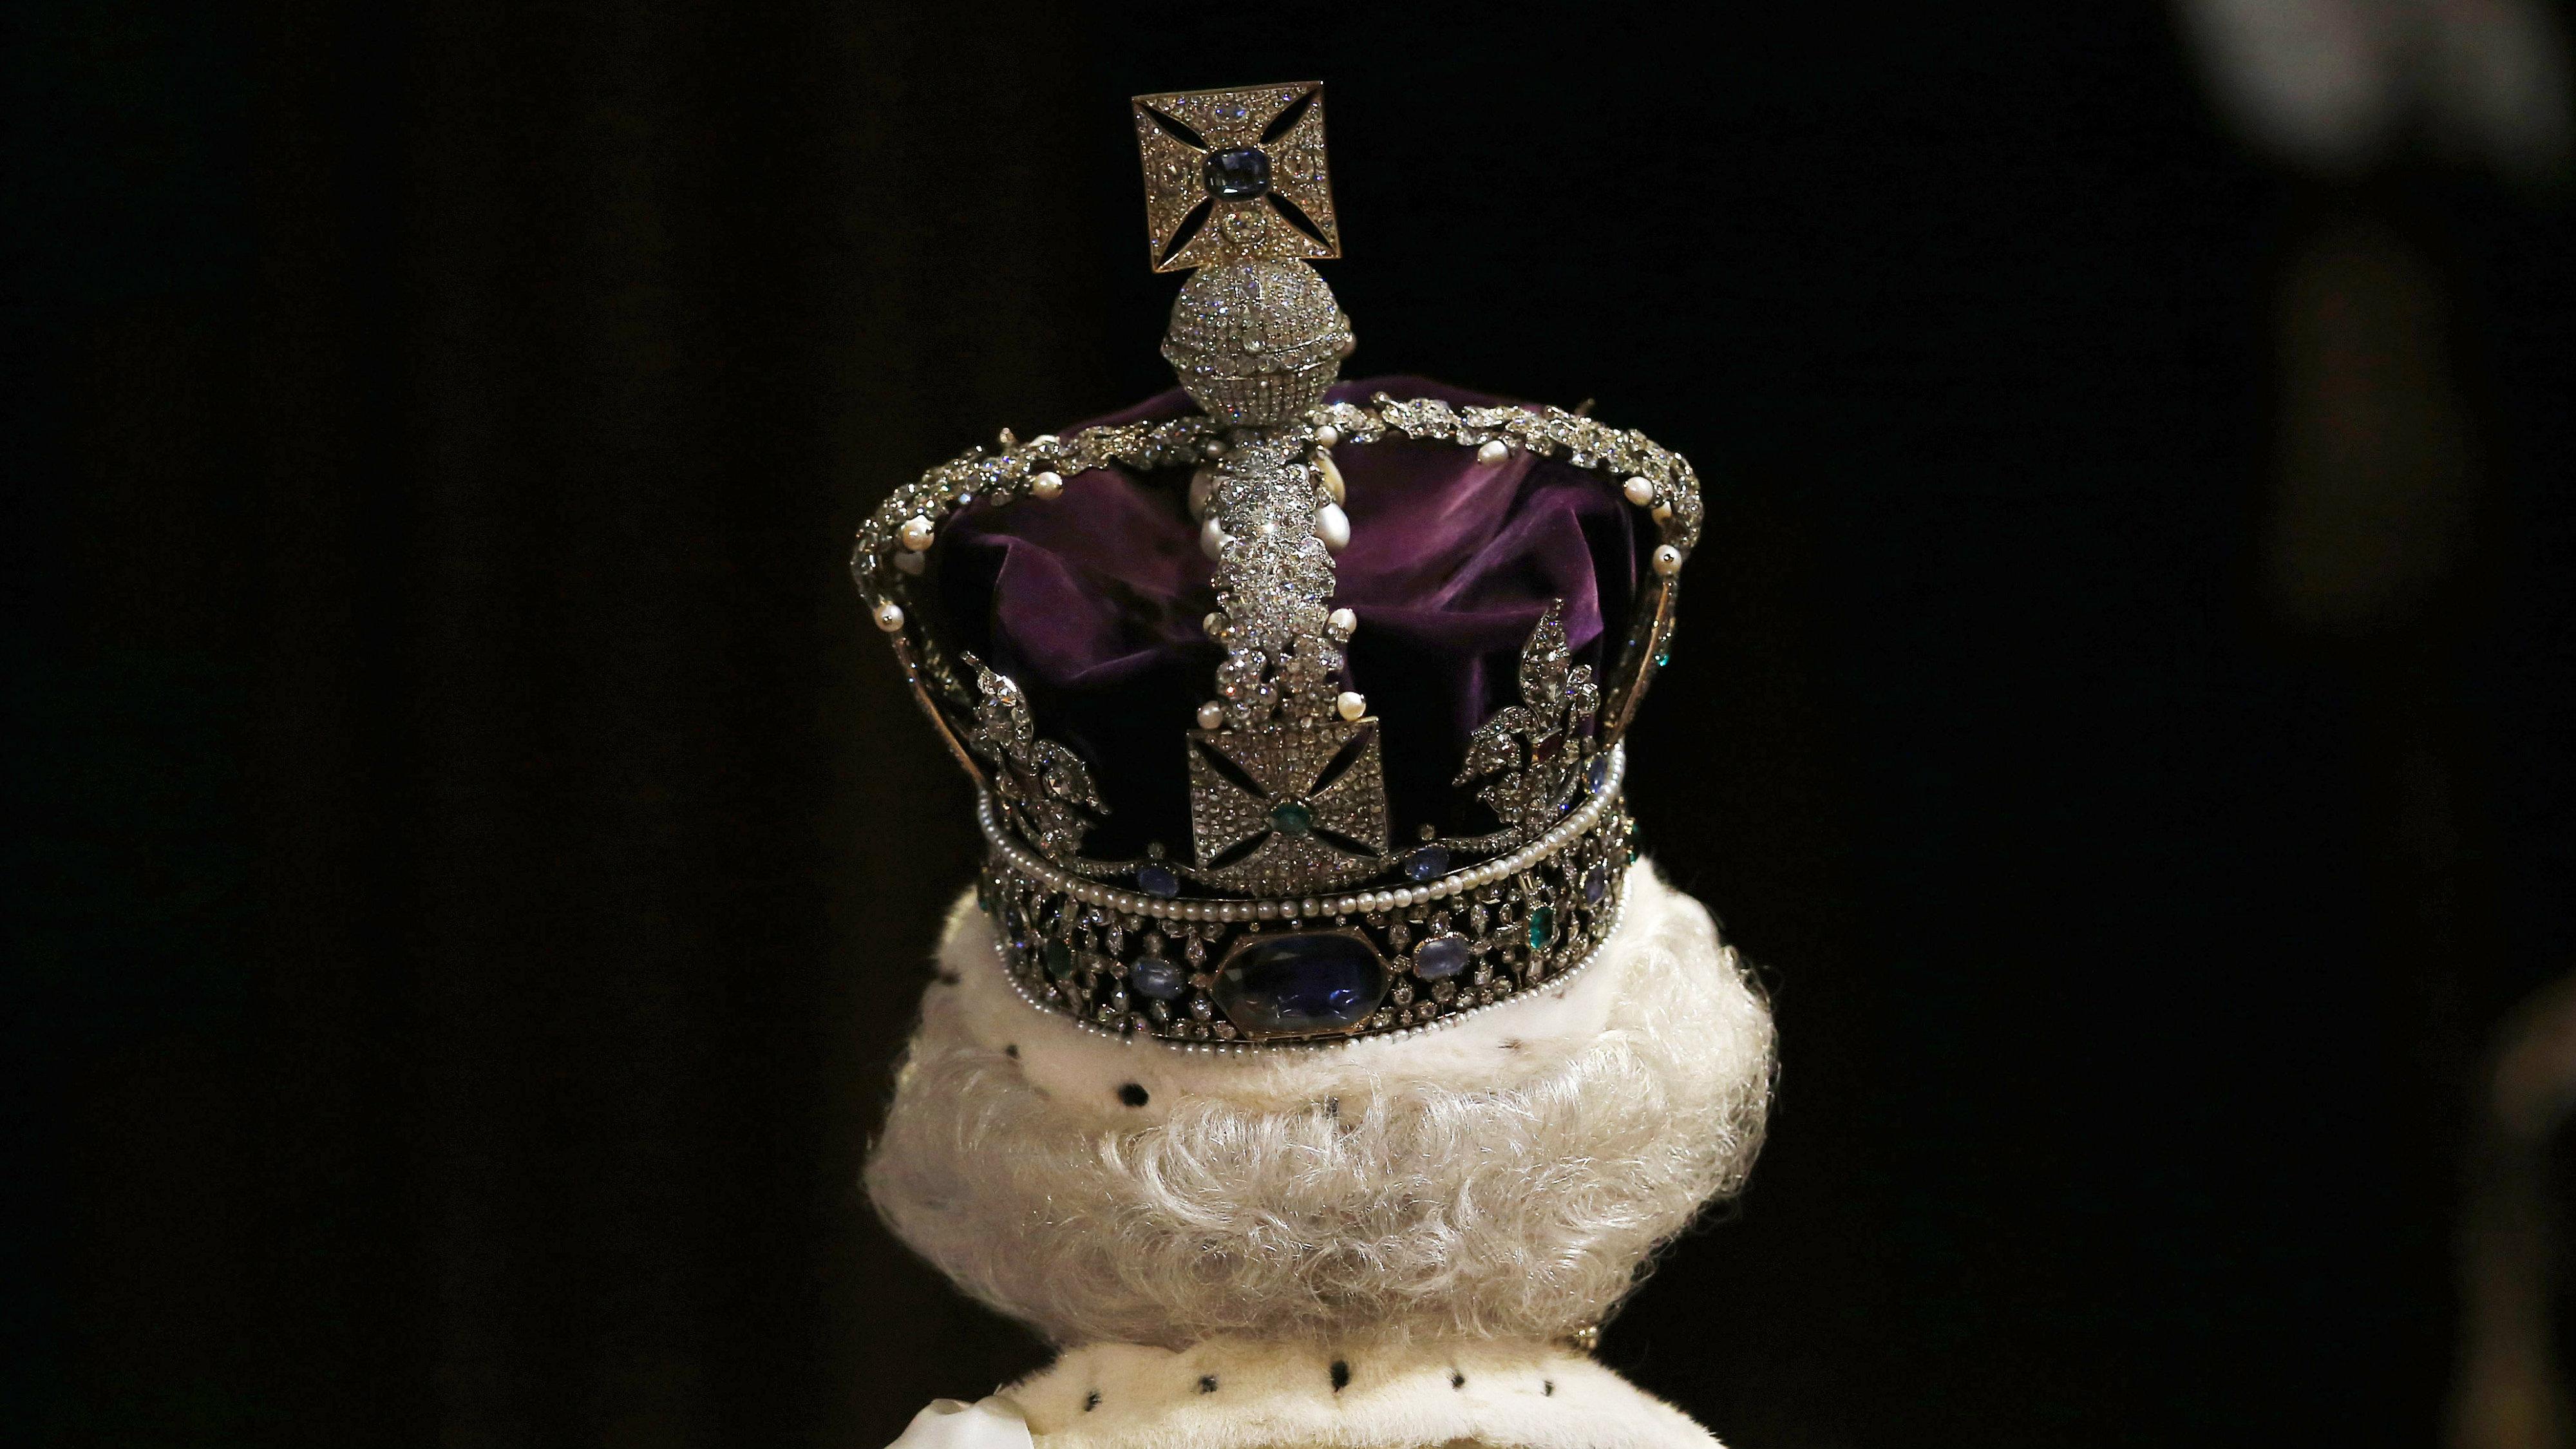 Queen Elizabeth wears crown to opening of Parliament